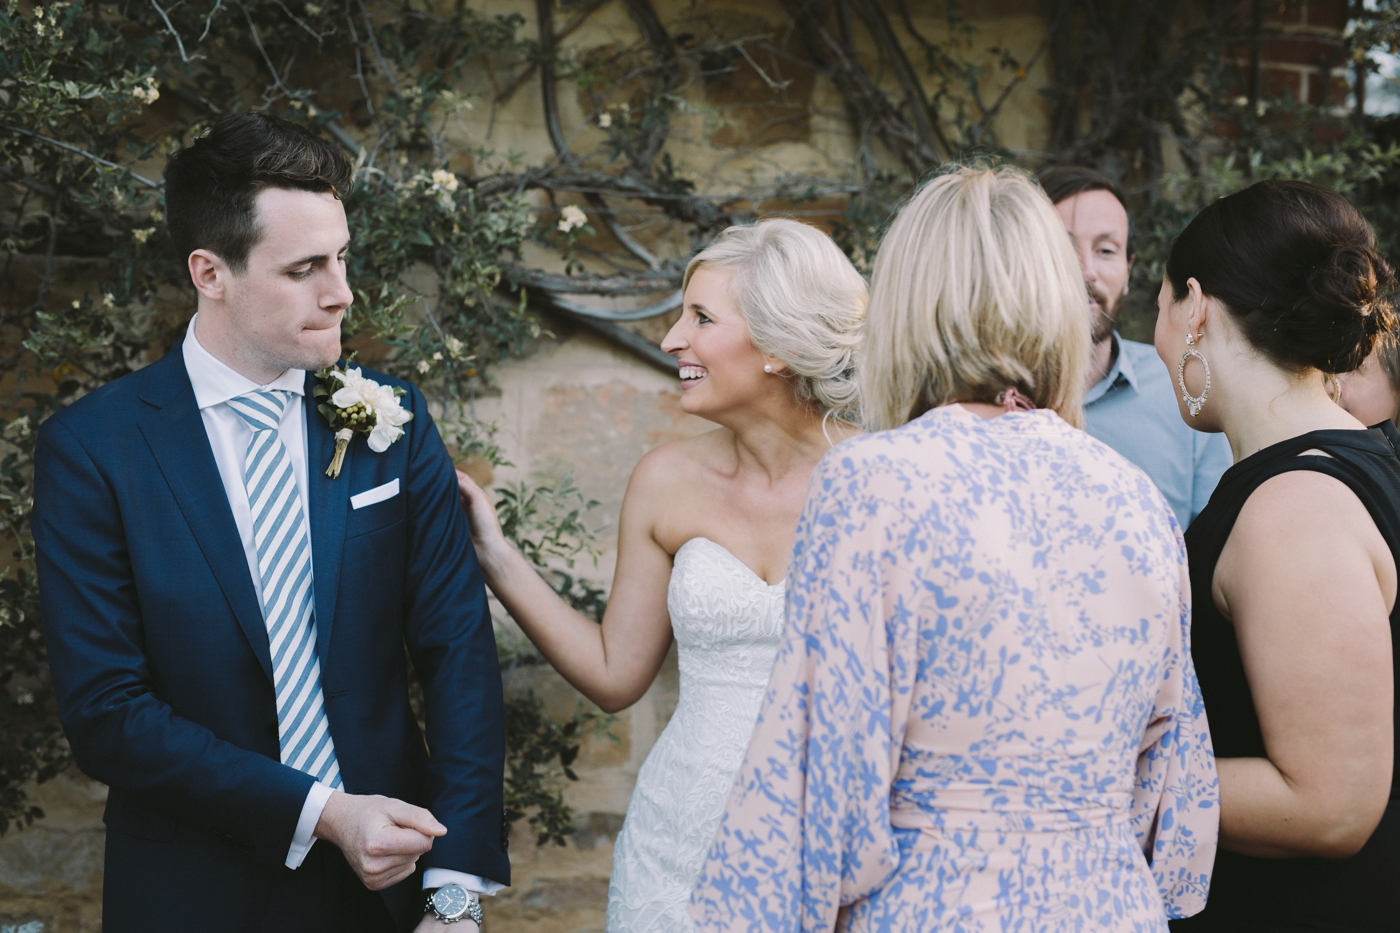 Lauren & Max - Marybank Estate Wedding - Natural wedding photographer in Adelaide - www.katherineschultzphotography.com 98